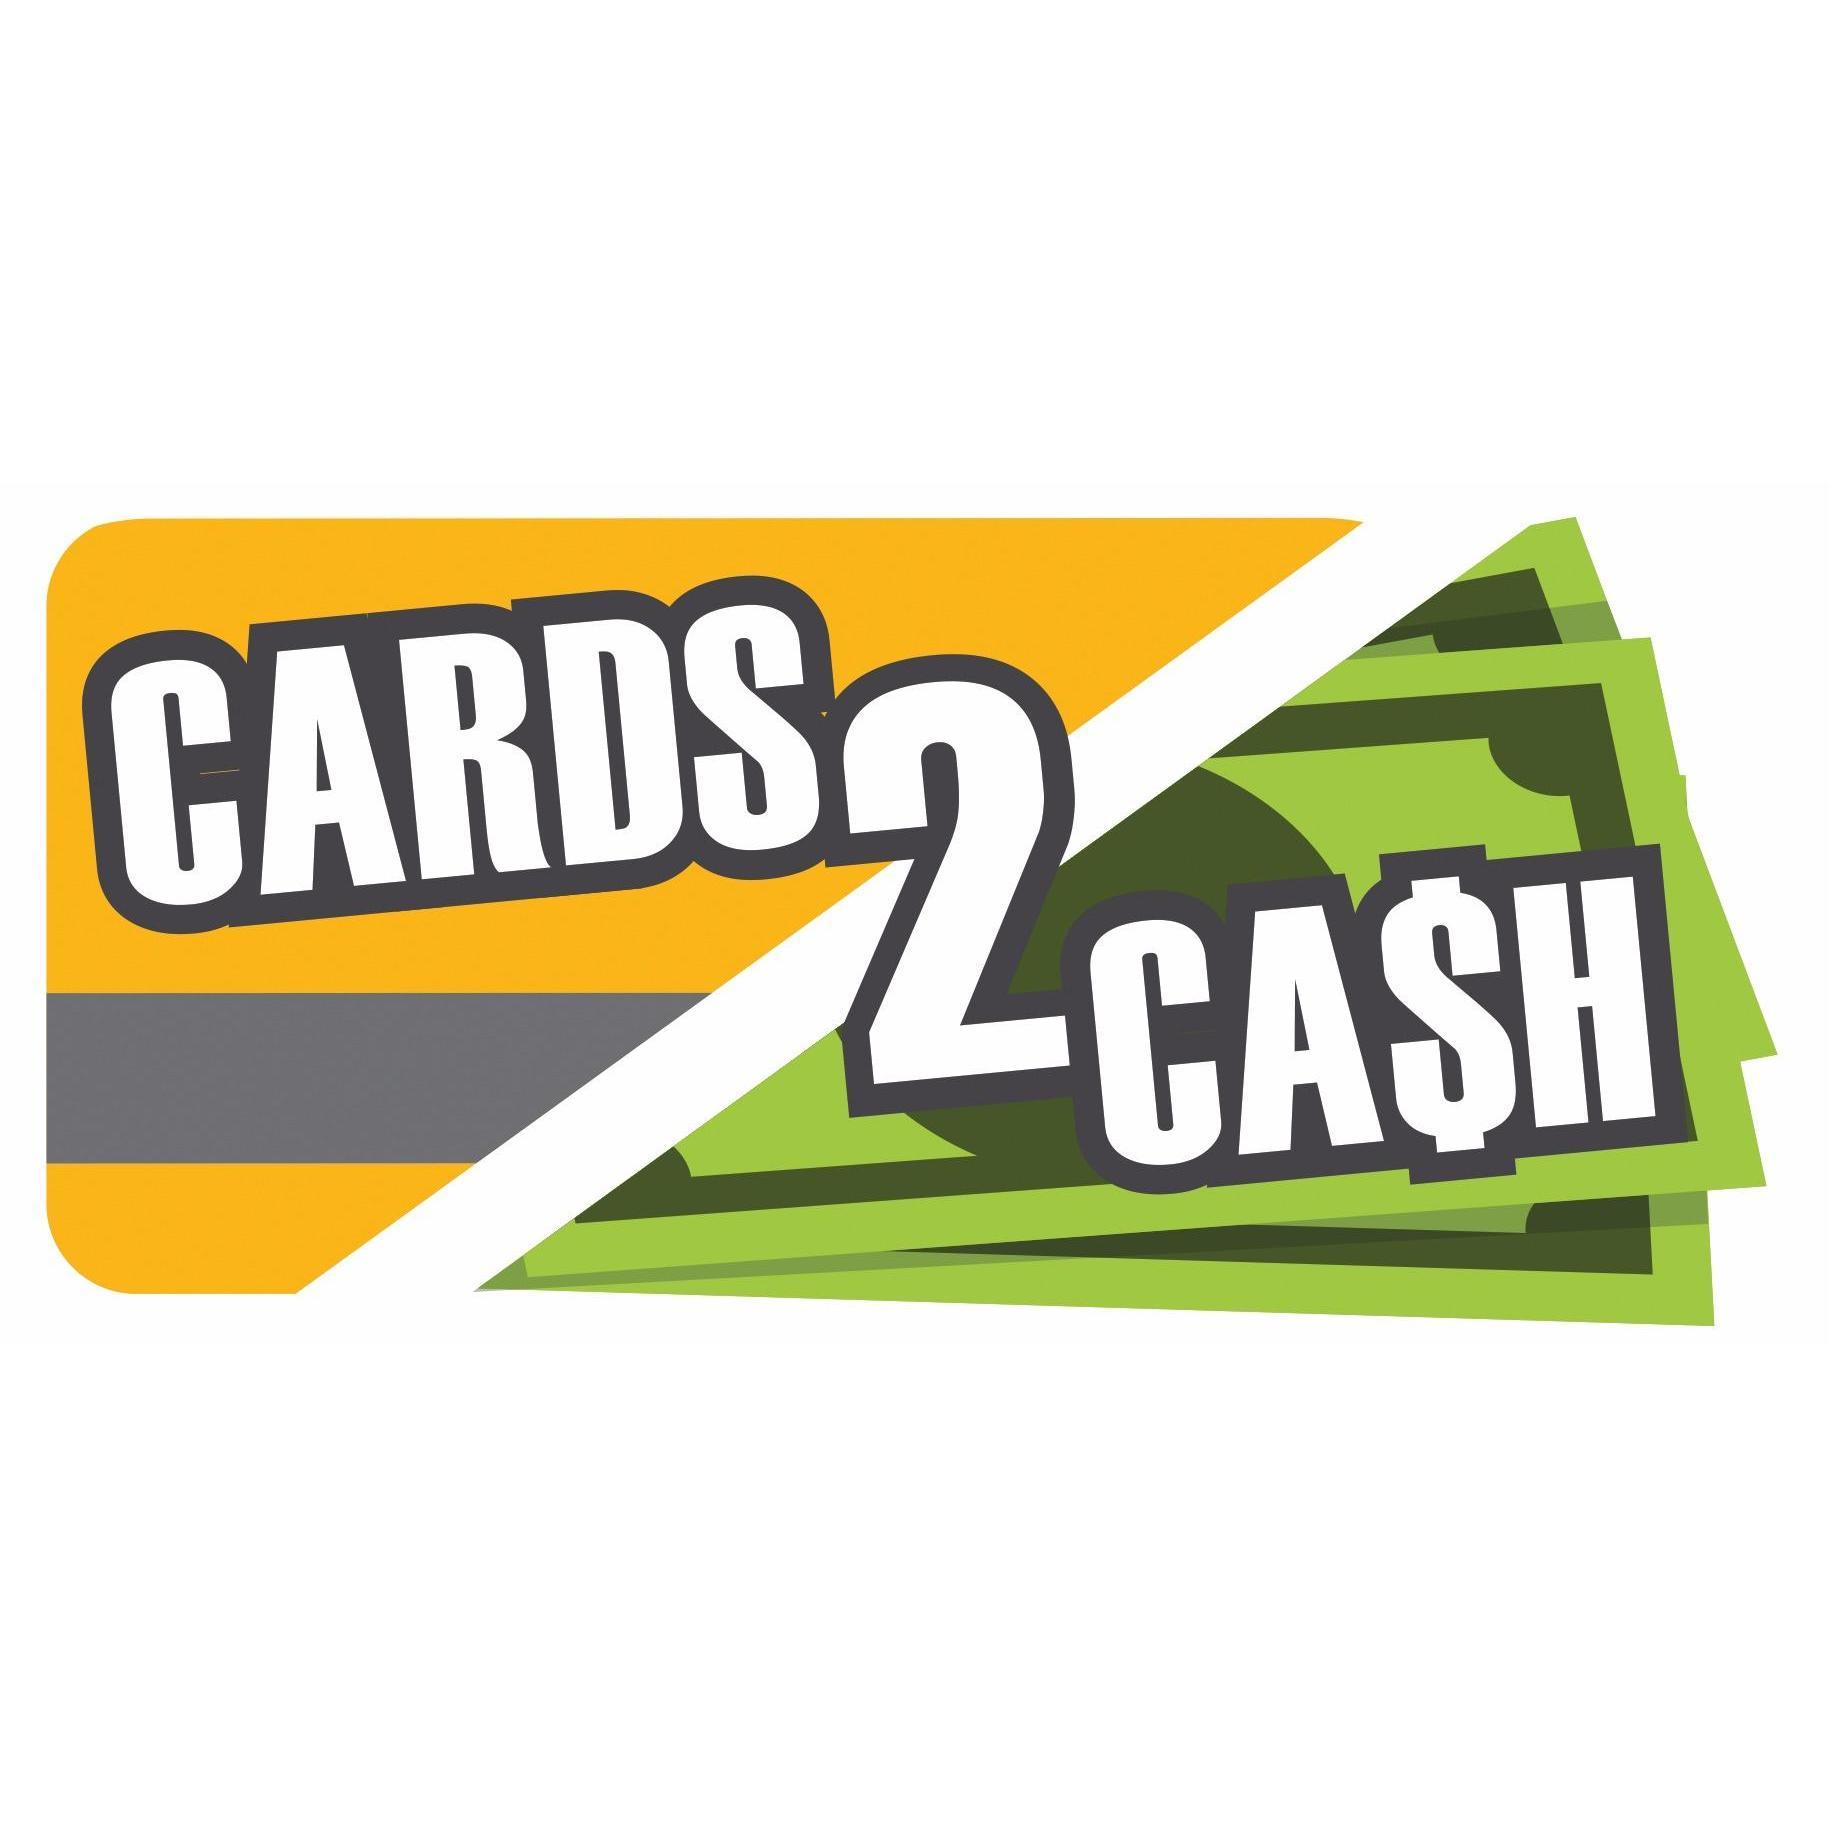 Cards 2 Cash